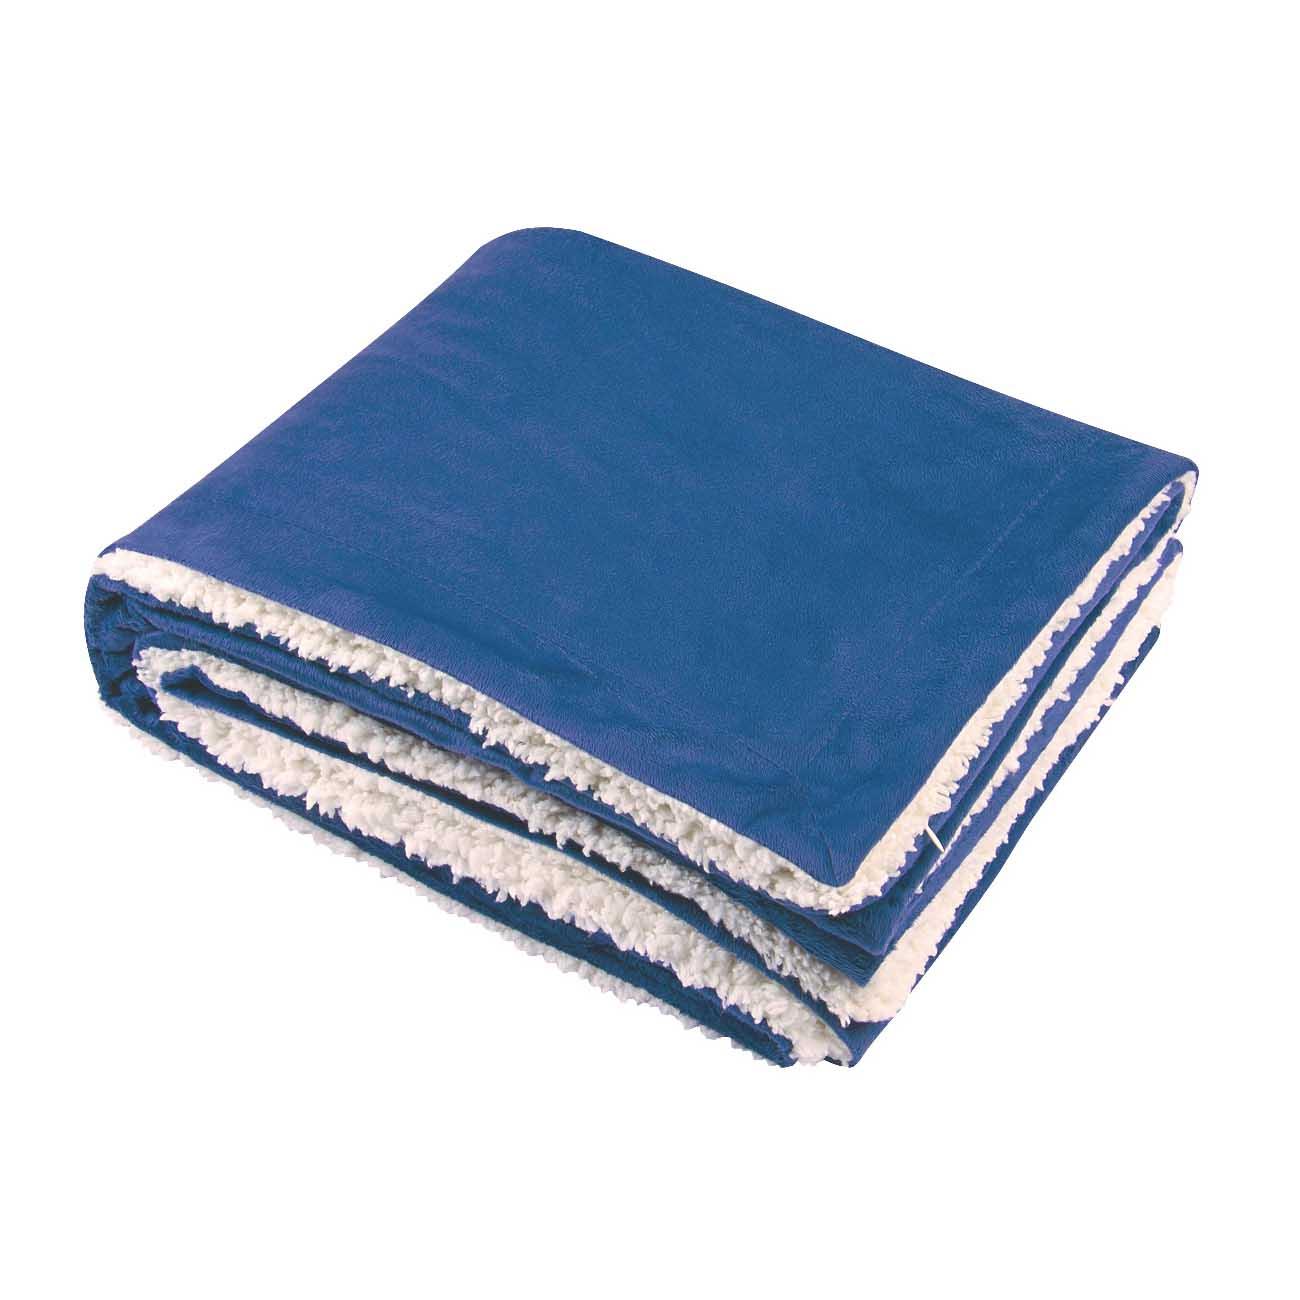 Sherpa blanket2